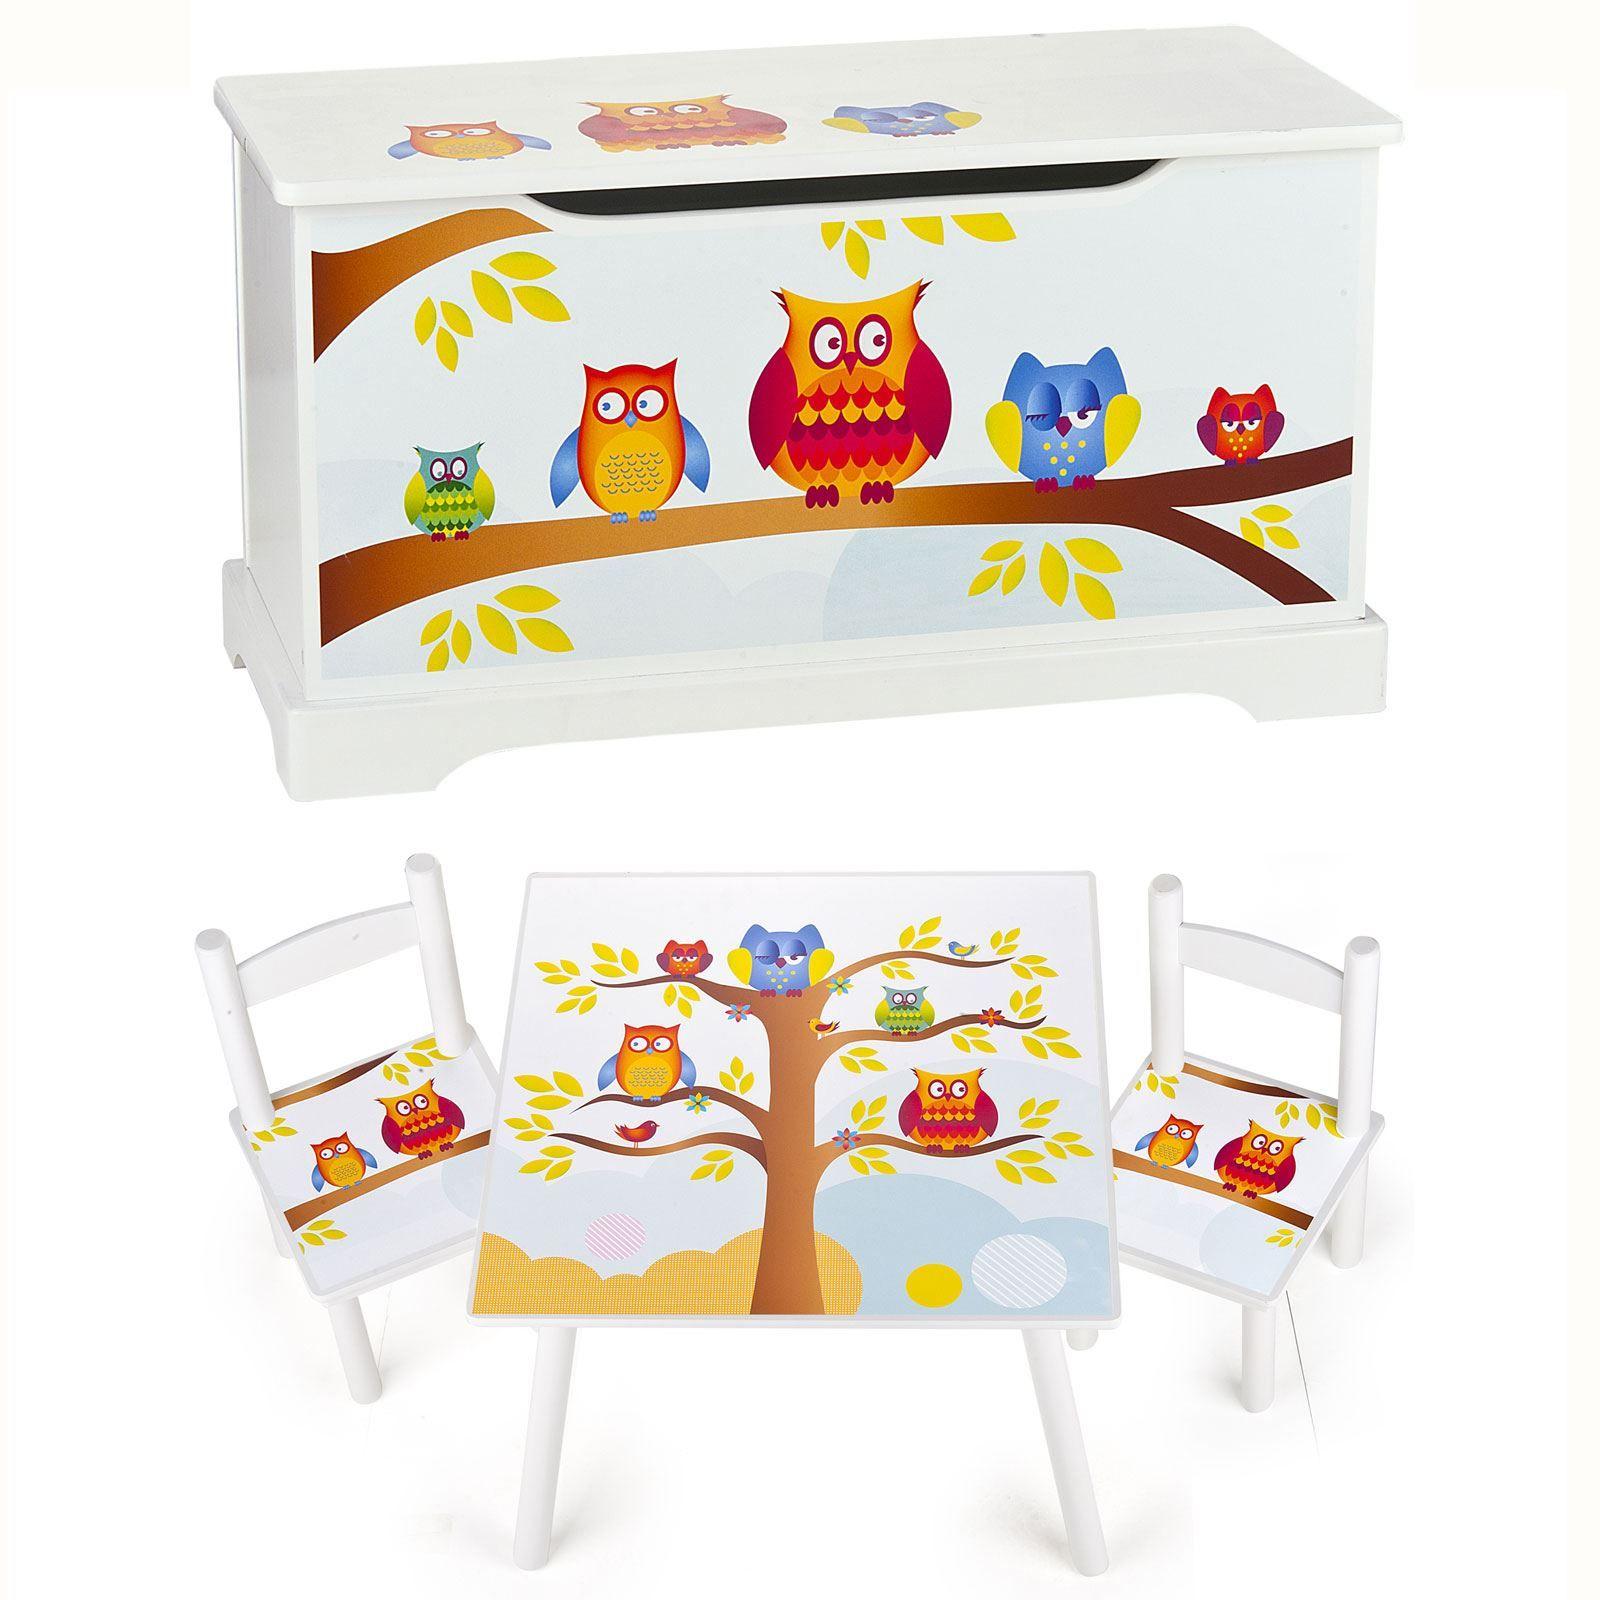 Owls Jungle Animals Wooden Bedroom Furniture Kids: CHILDRENS WOODEN FURNITURE